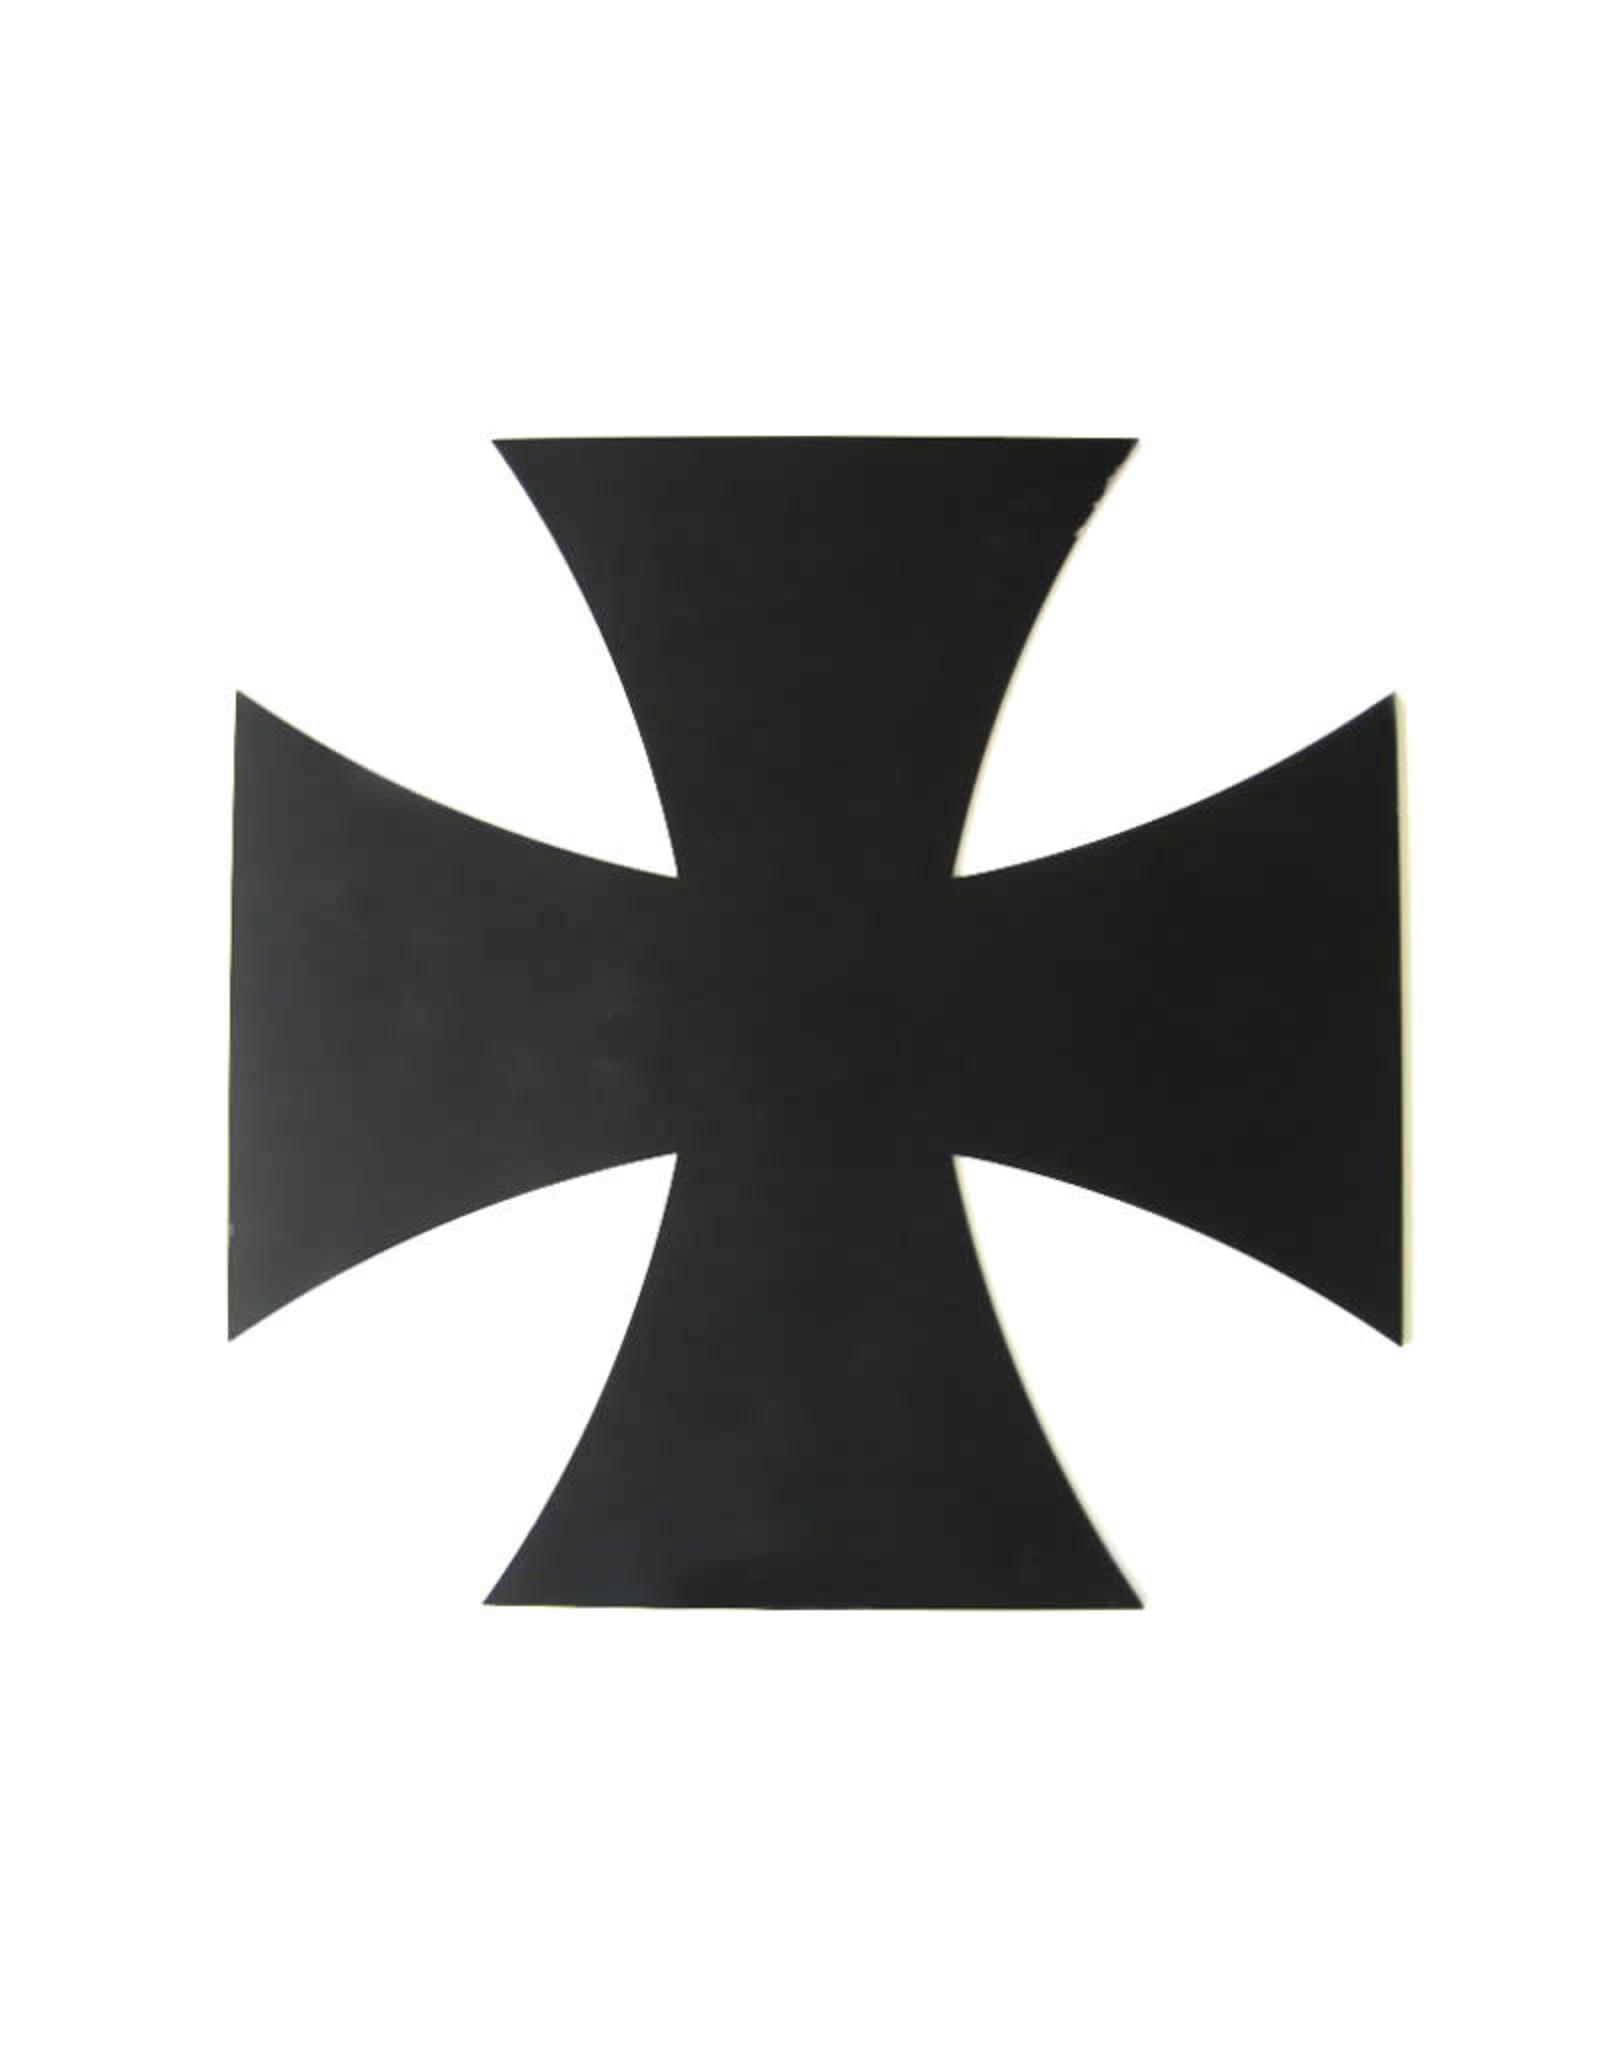 Harder & Steenbeck Harder & Steenbeck Iron Cross Dimensions 40 x 40 cm